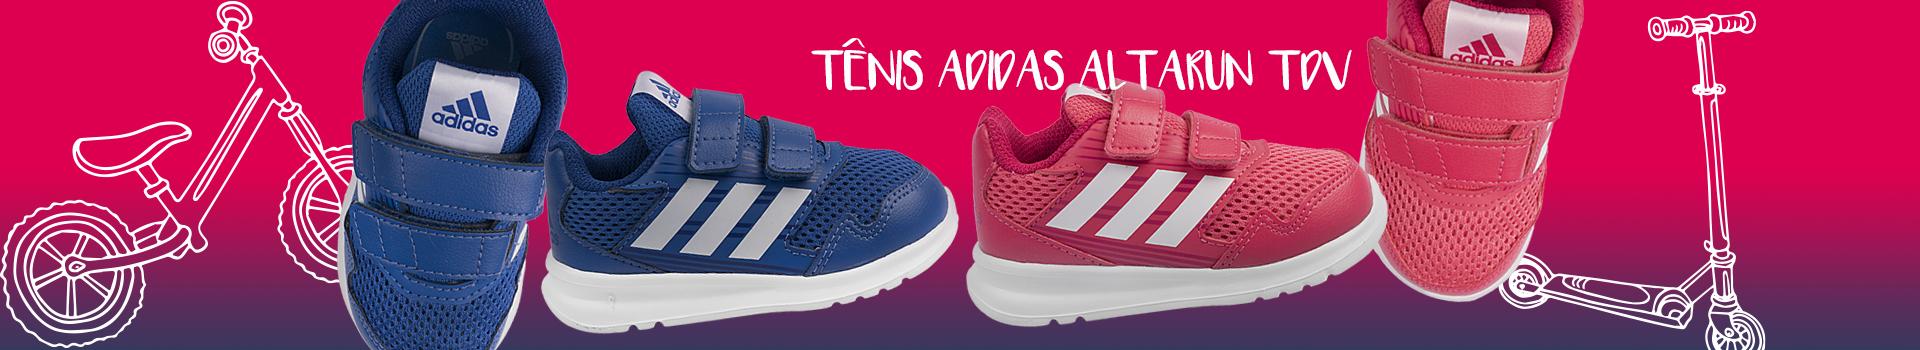 tvdesk_p2-14_01_19-adidas_Altarun